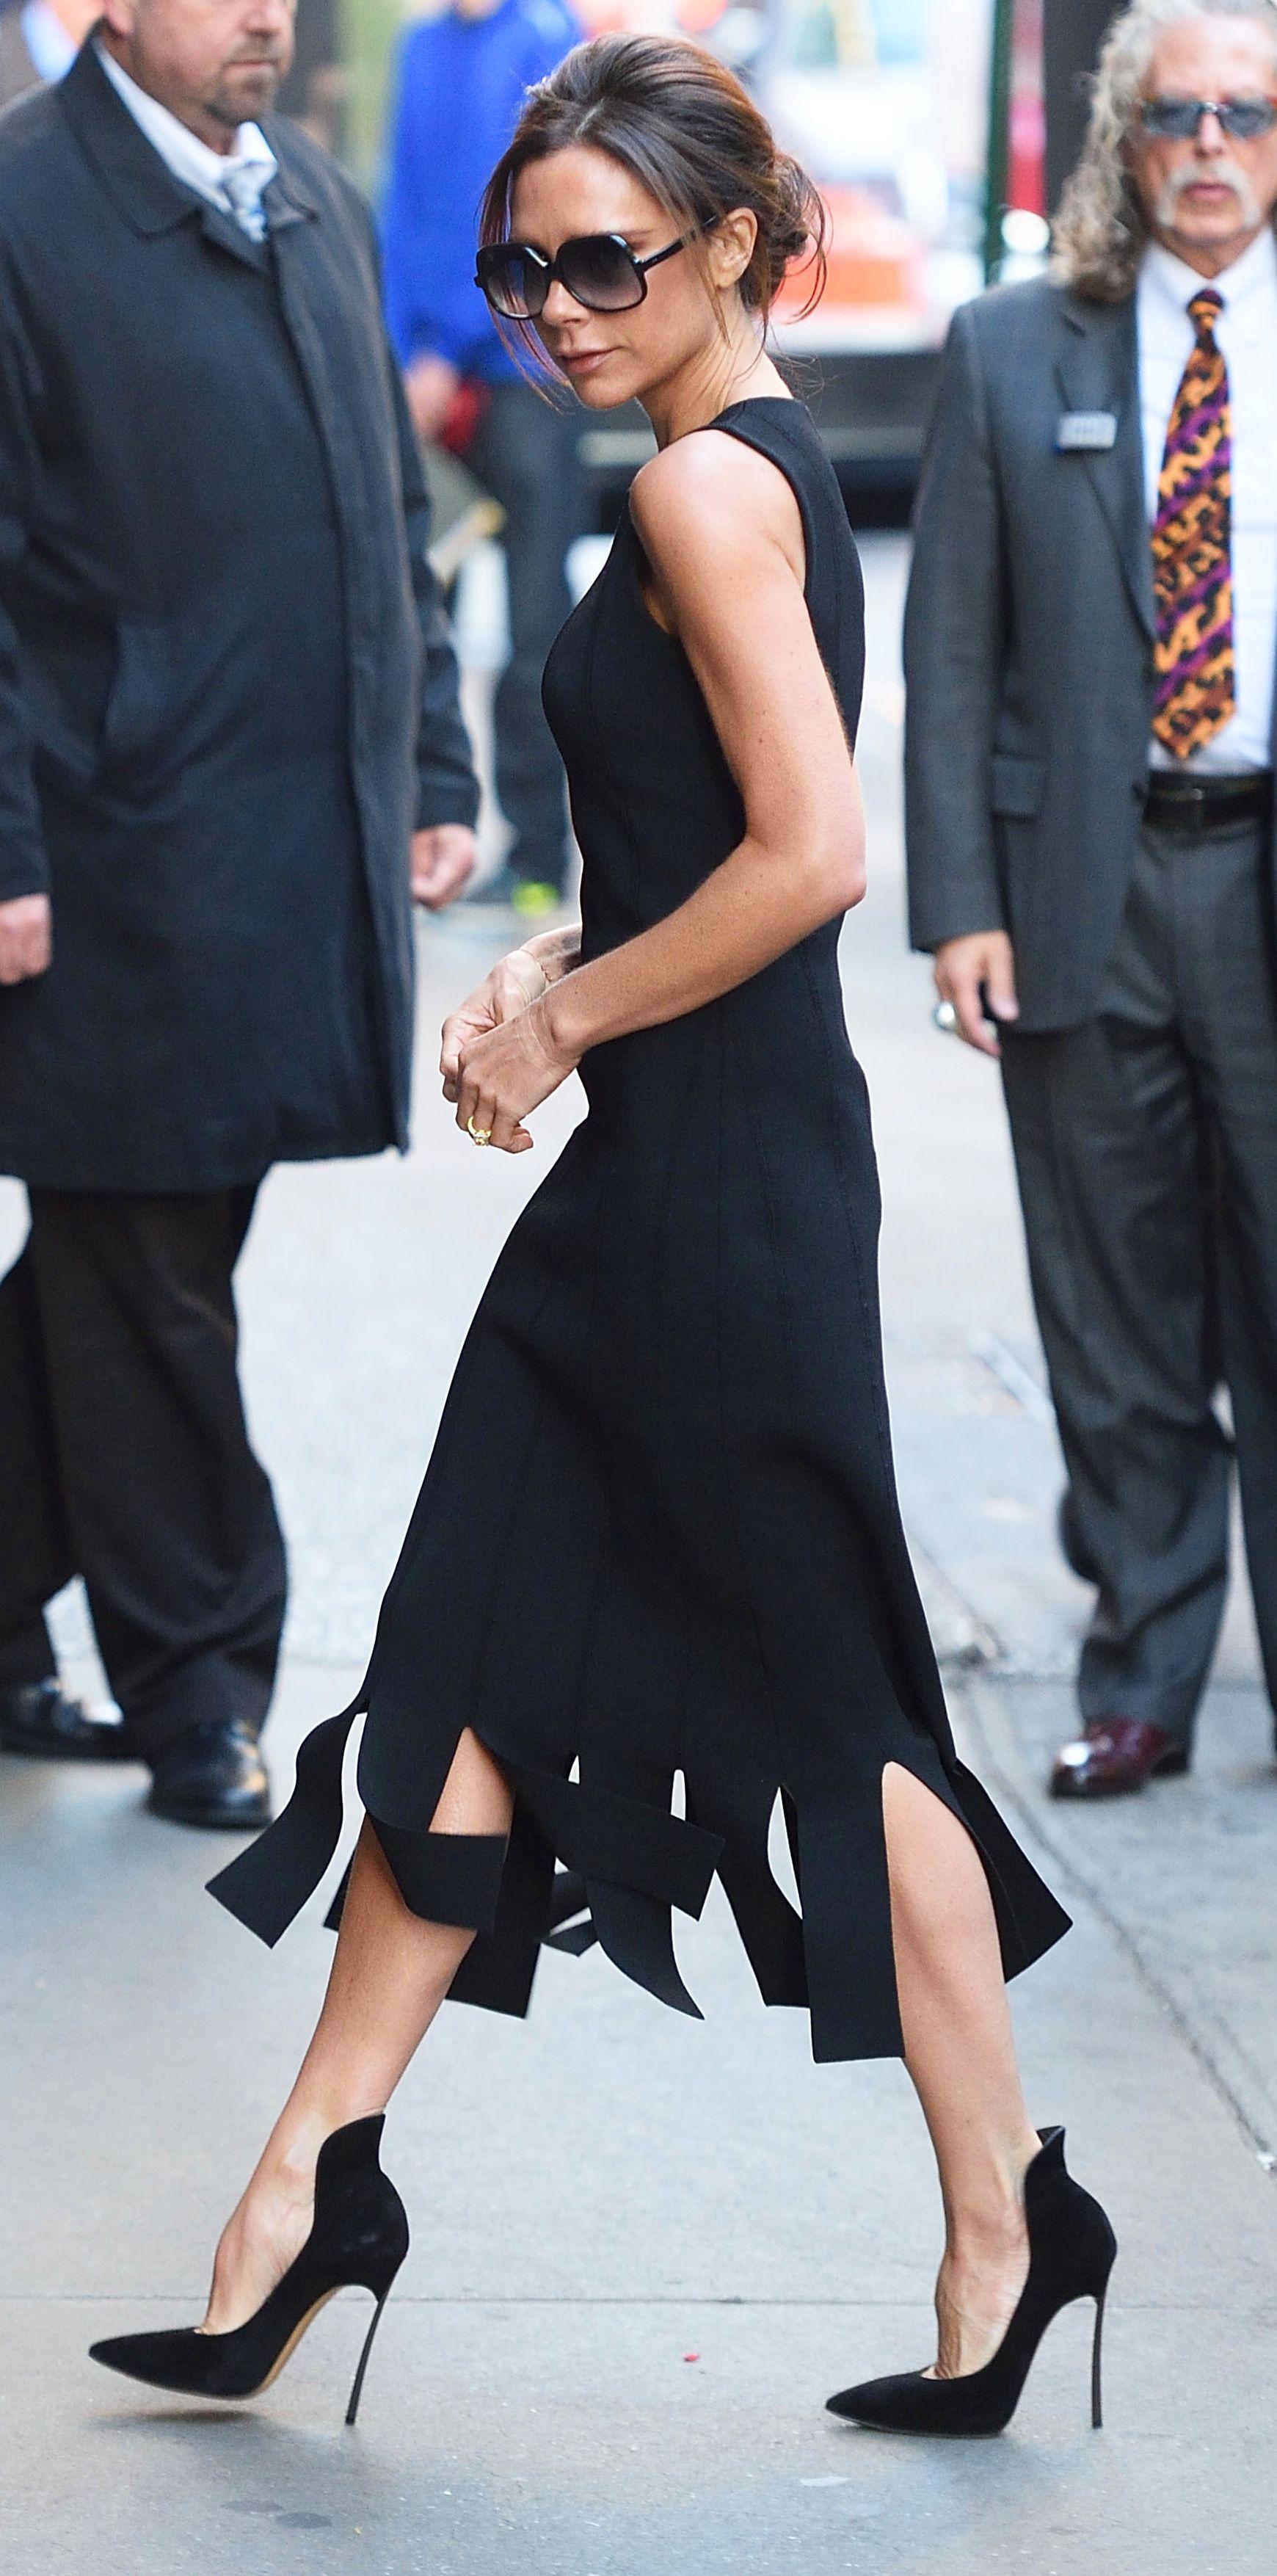 How To Dress Like Victoria Beckham Victoria Beckham Style Fashion Celebrity Fashion Trends [ 3509 x 1740 Pixel ]